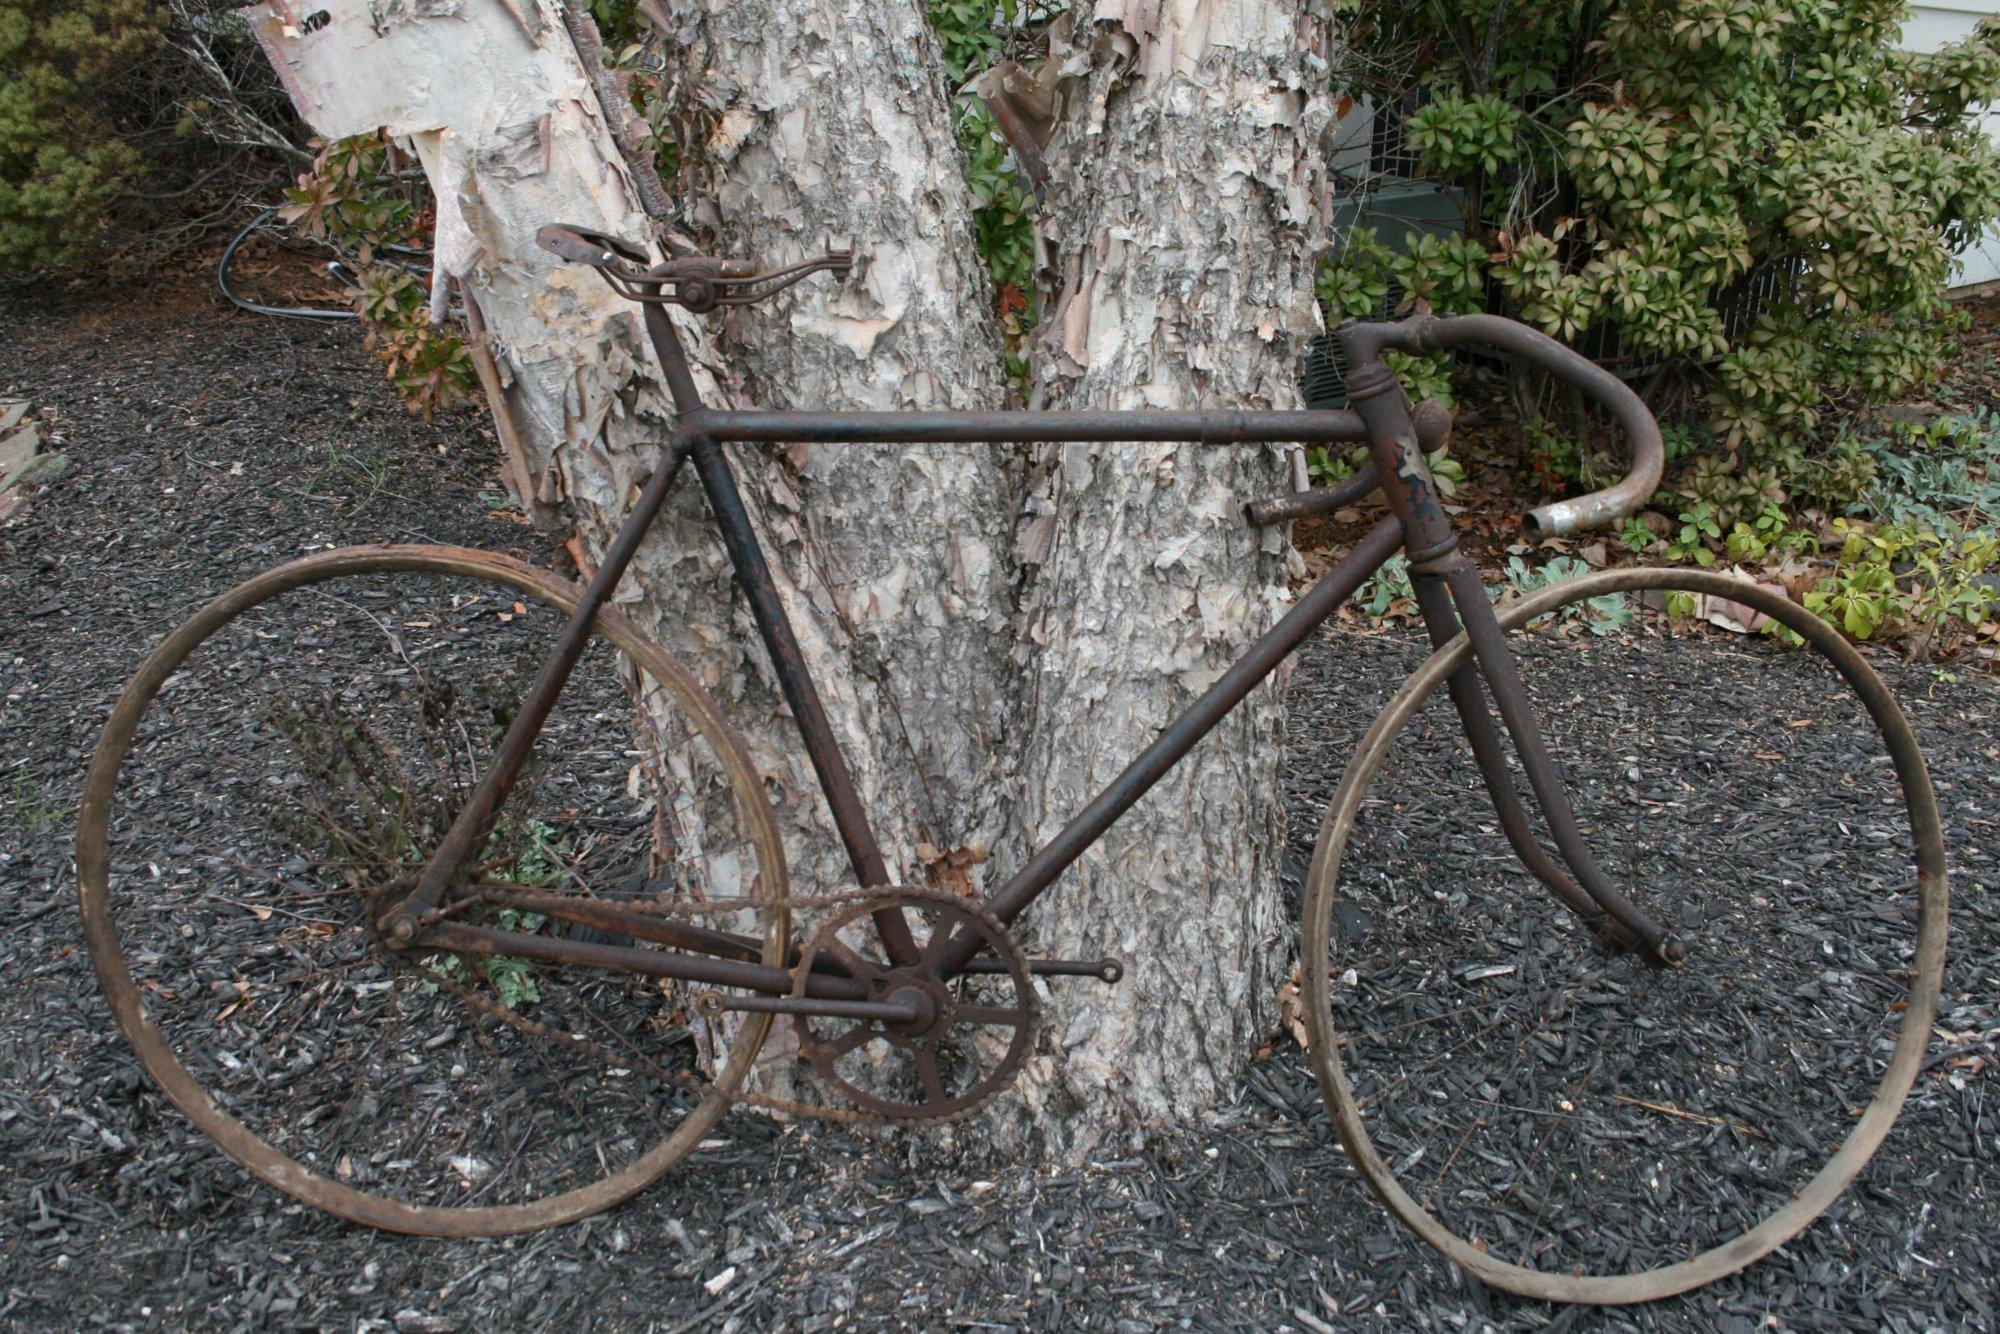 Underground Bicycle Shop IMG_2492.jpg